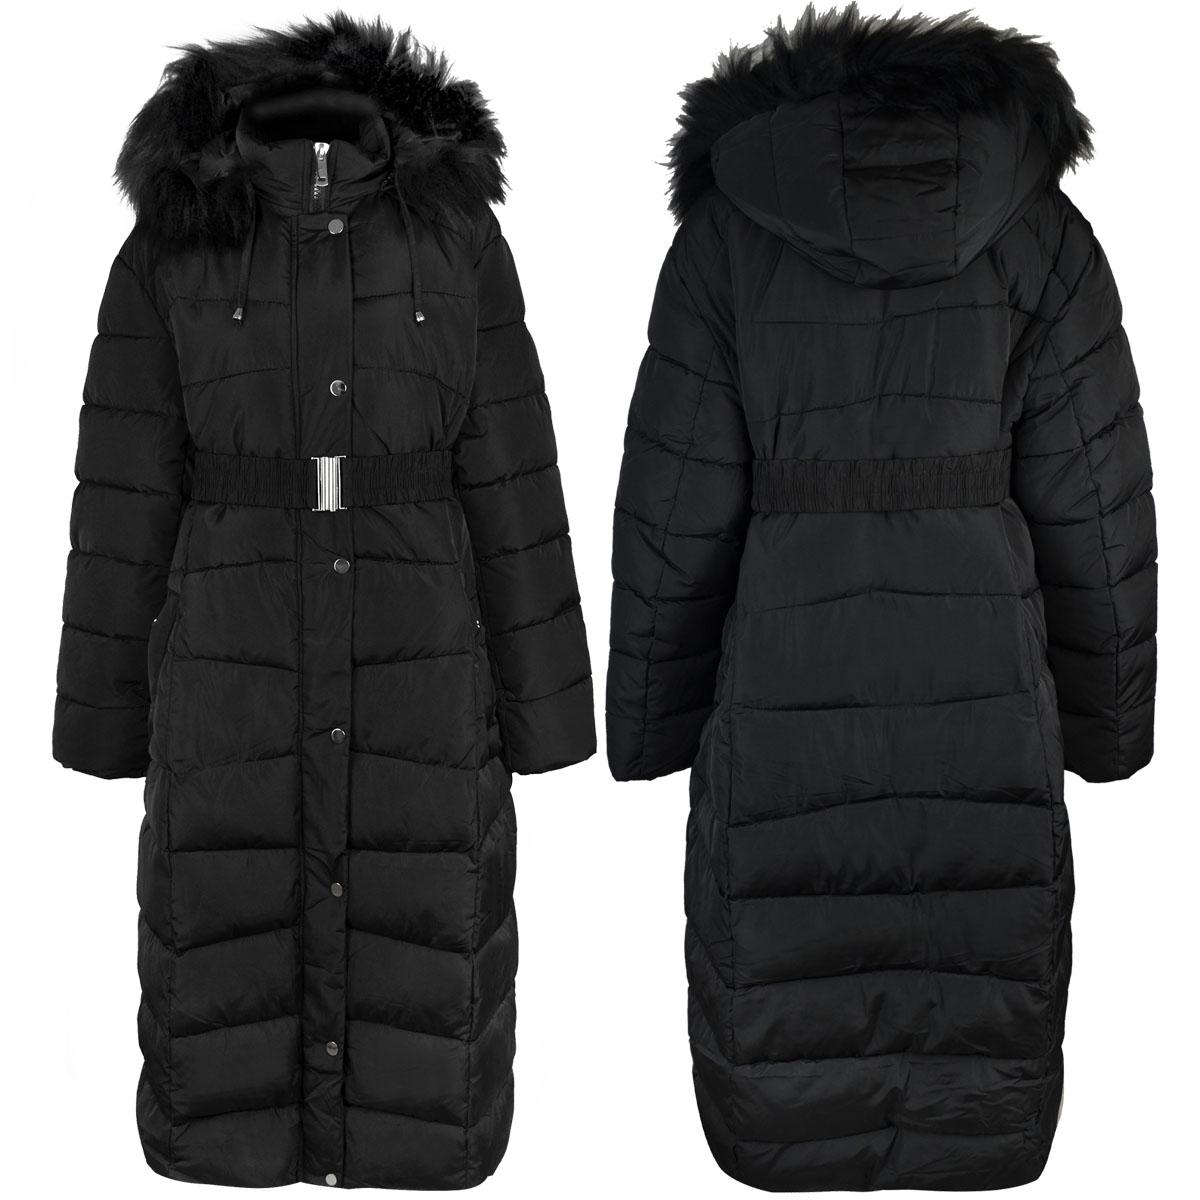 Regatta Womens Ladies Patrina Insulated Fur Lined Fashion Jacket